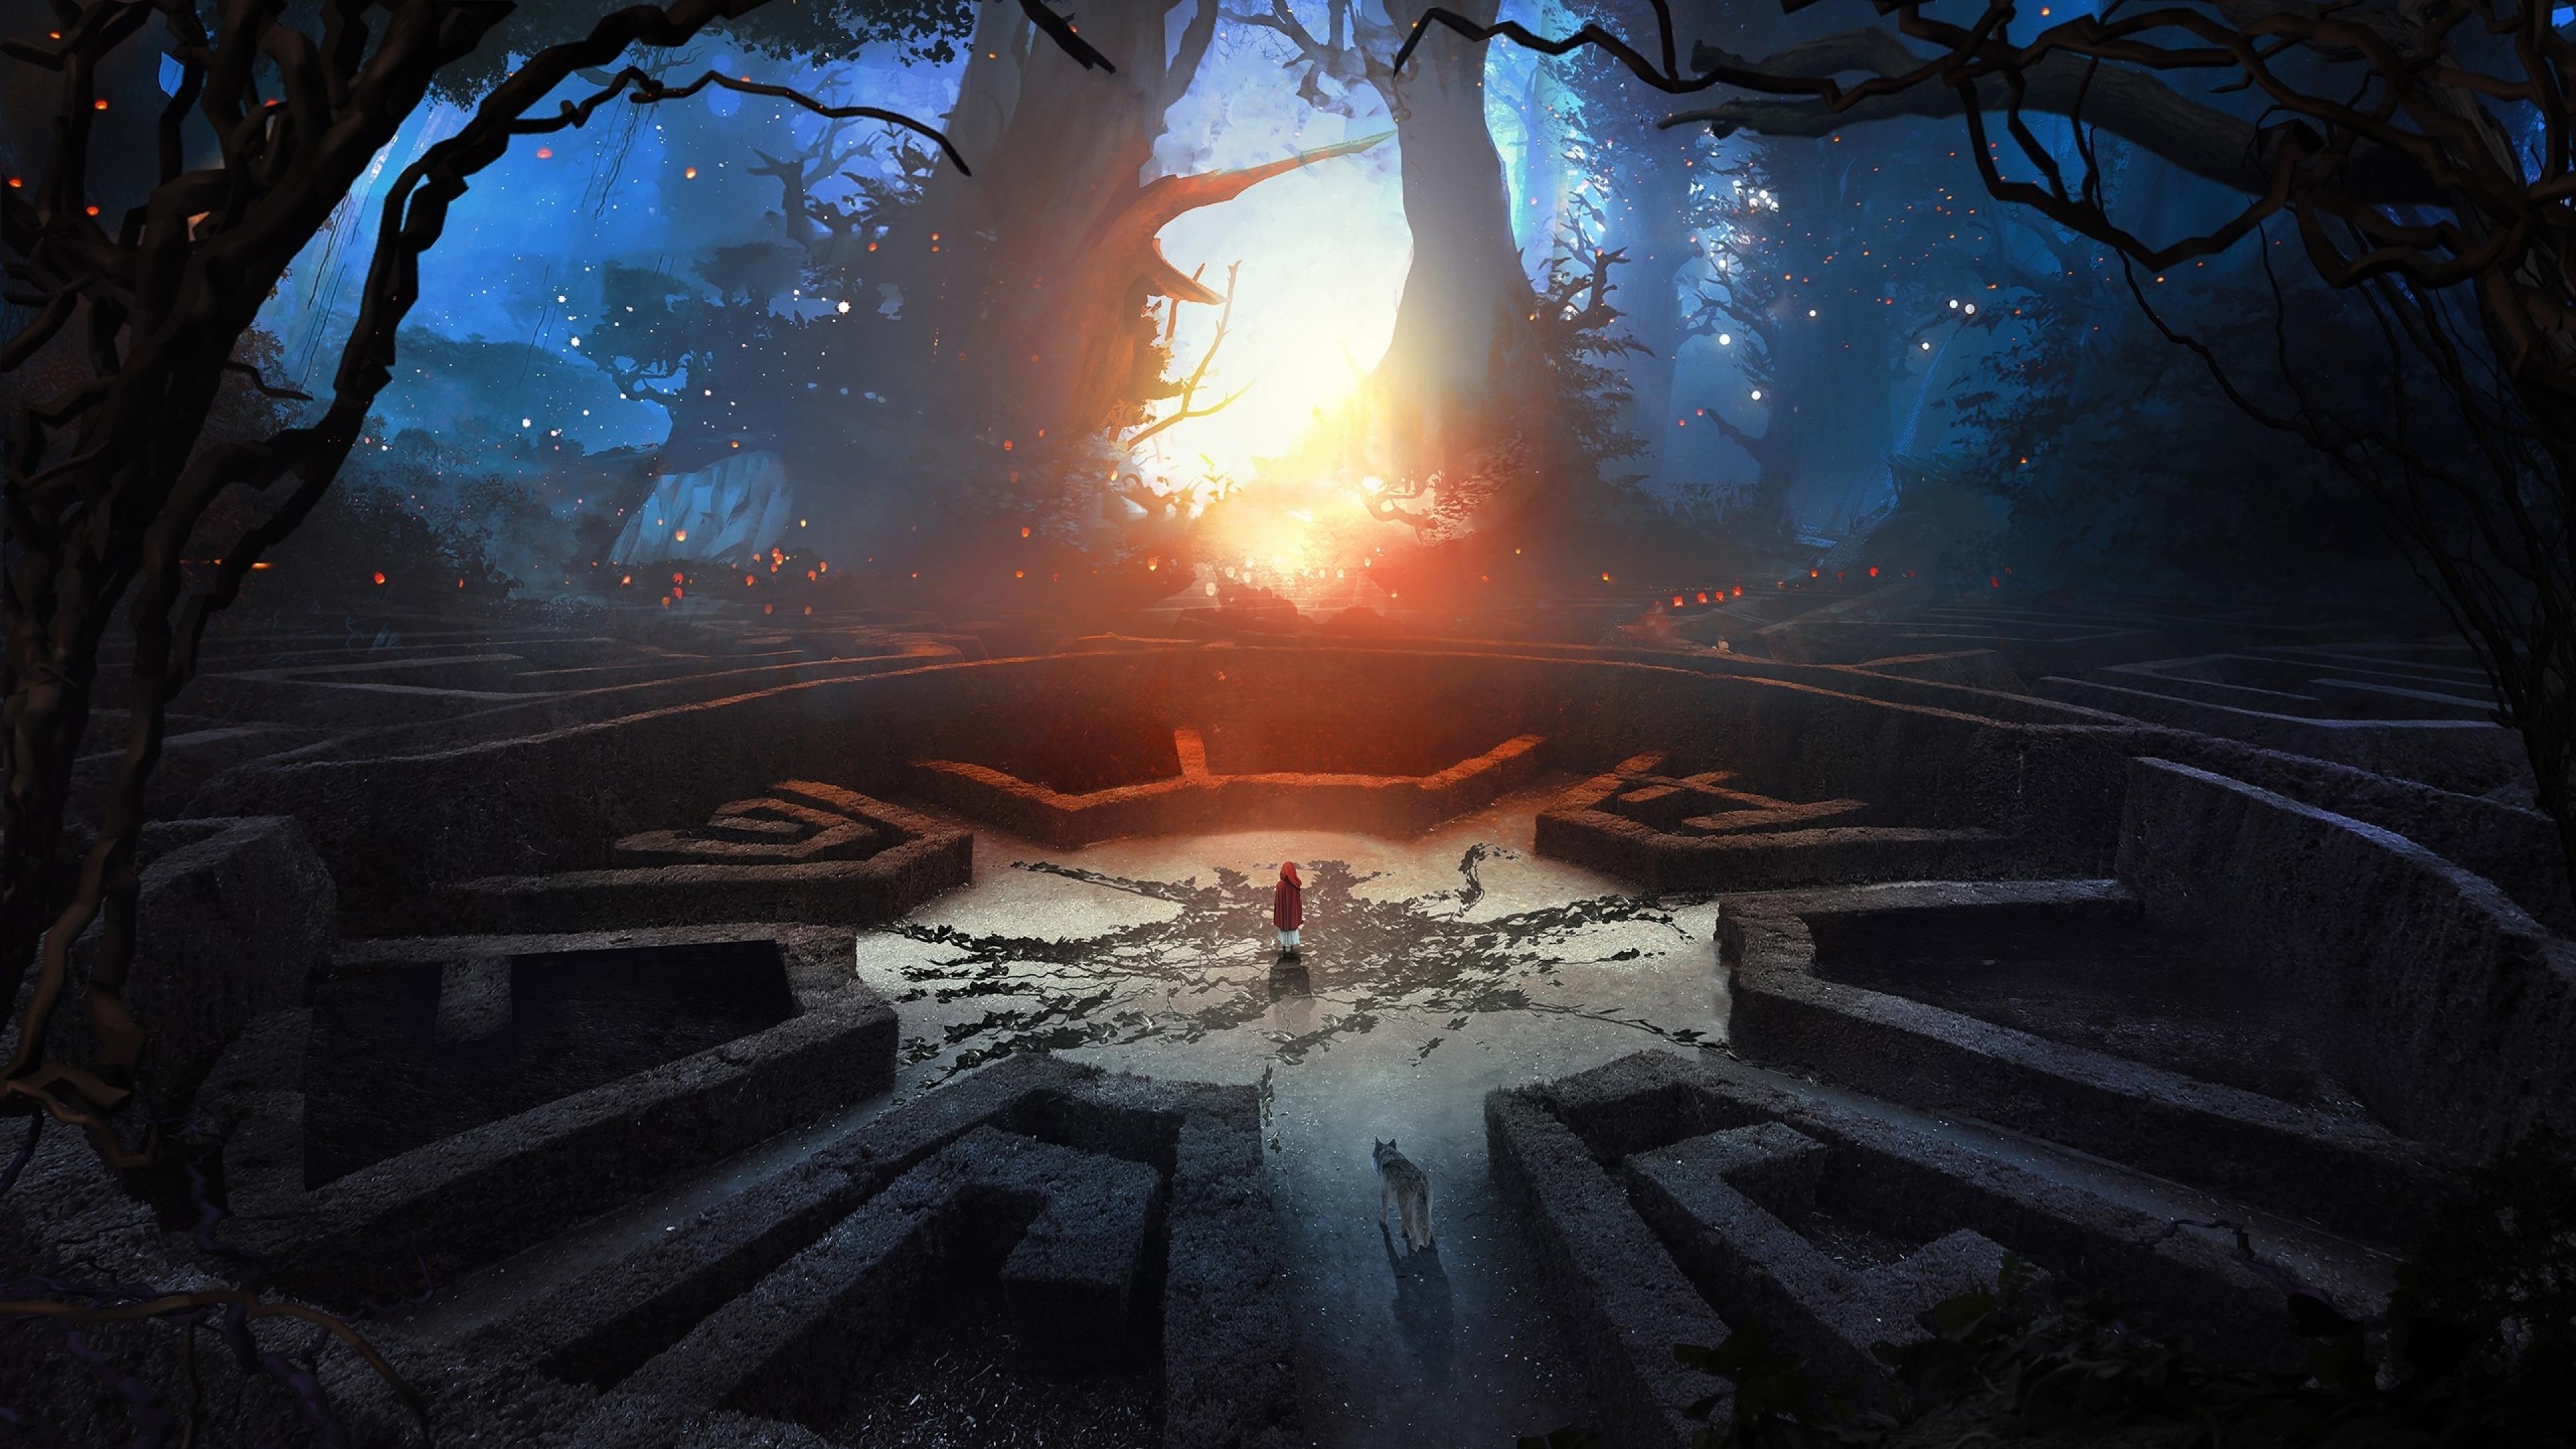 Labyrinth wolf and boy 3d abstract fantasy art full hd 2k - Fantasy wallpaper digital art ...